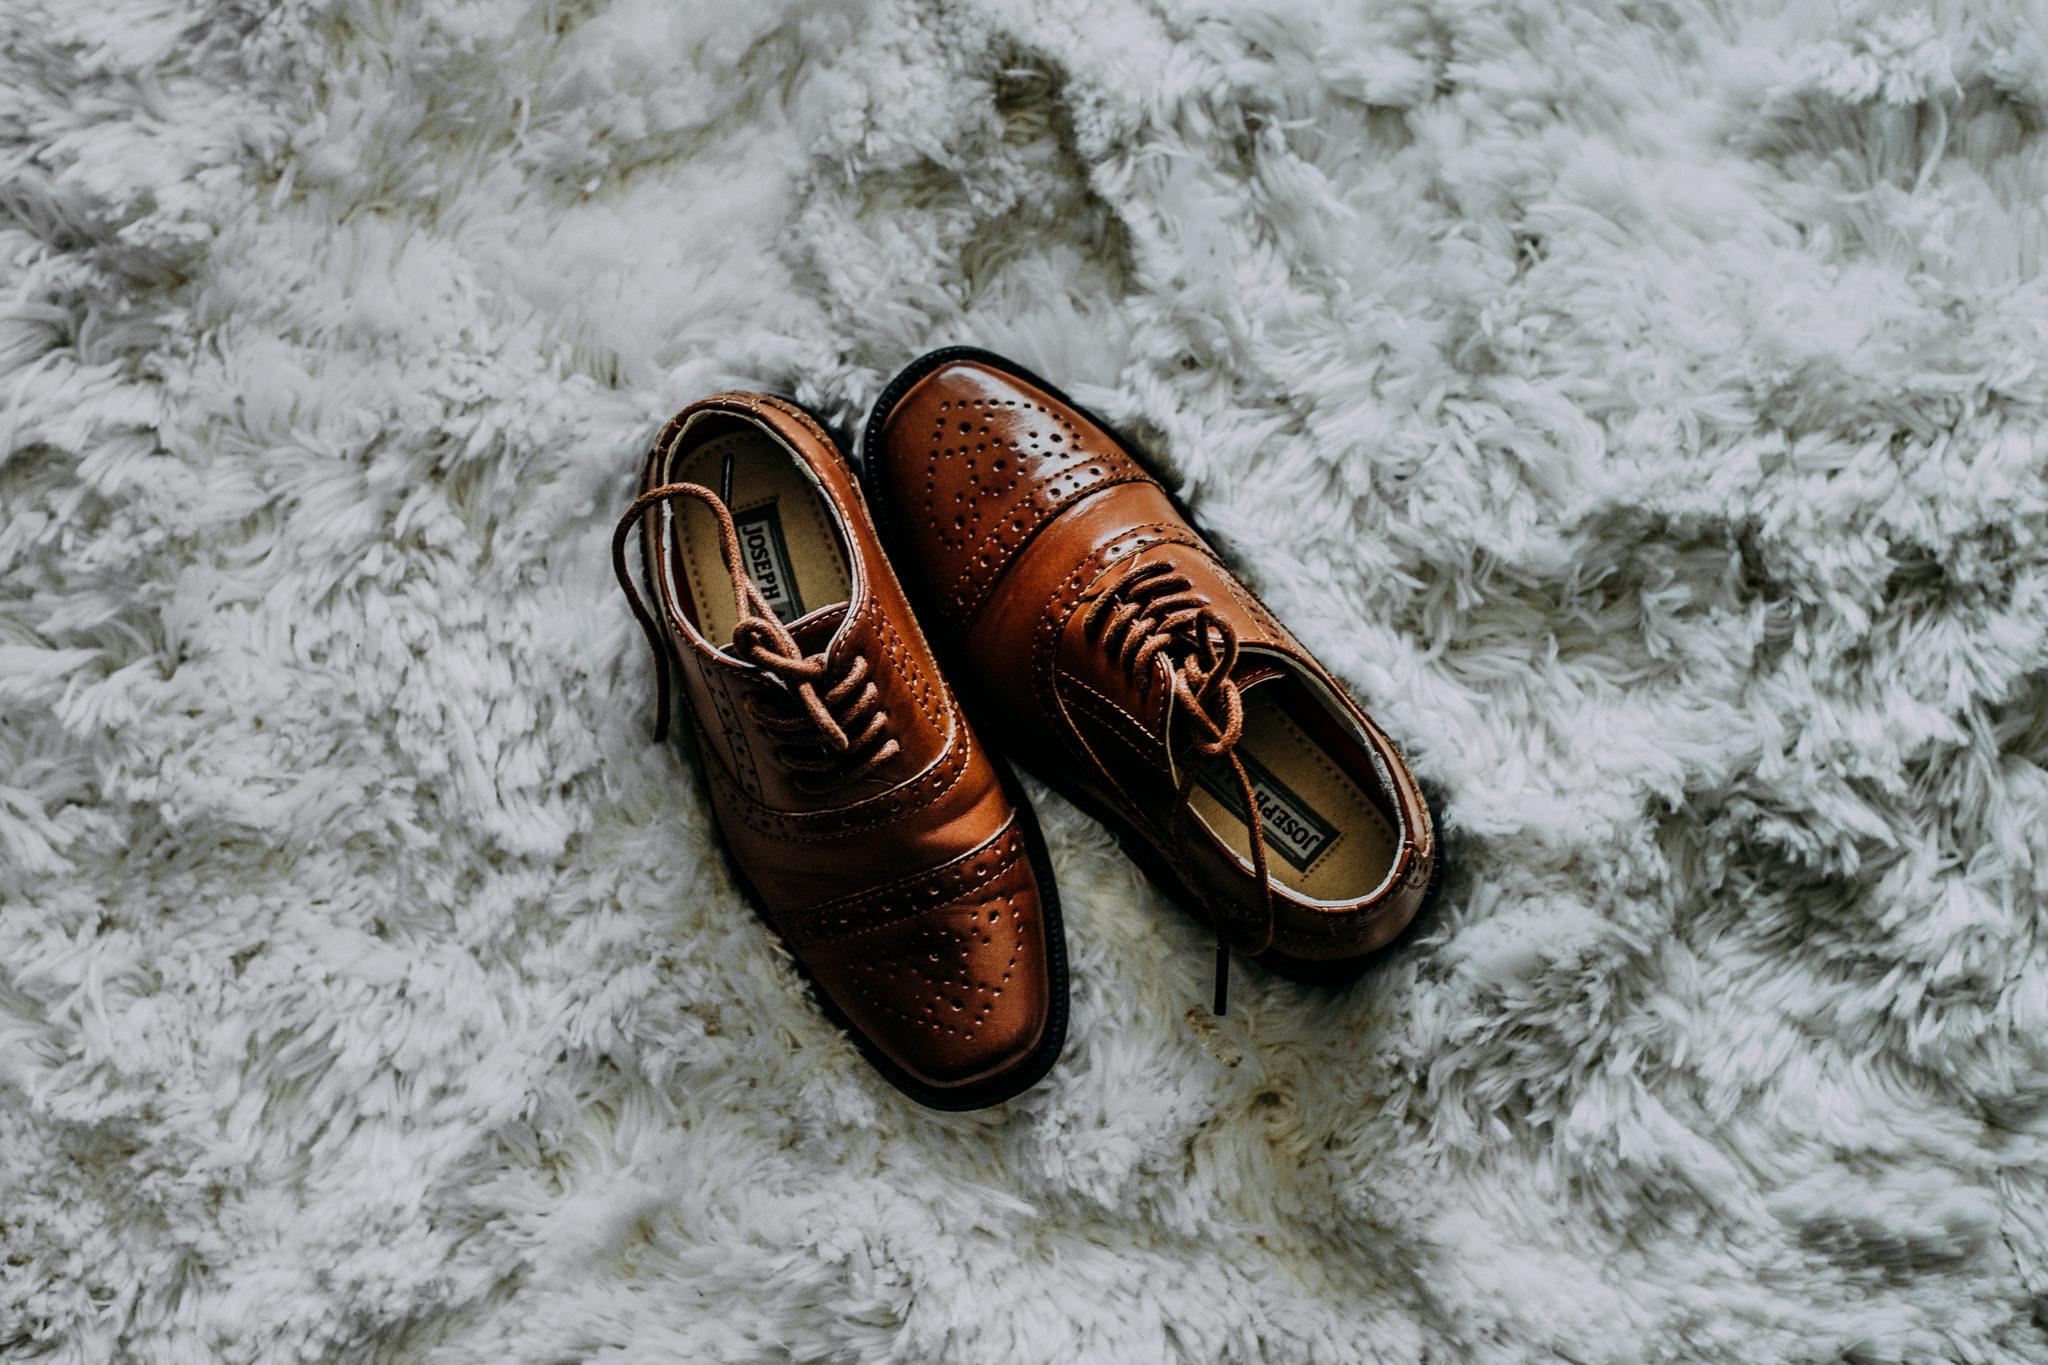 ringbearer shoes